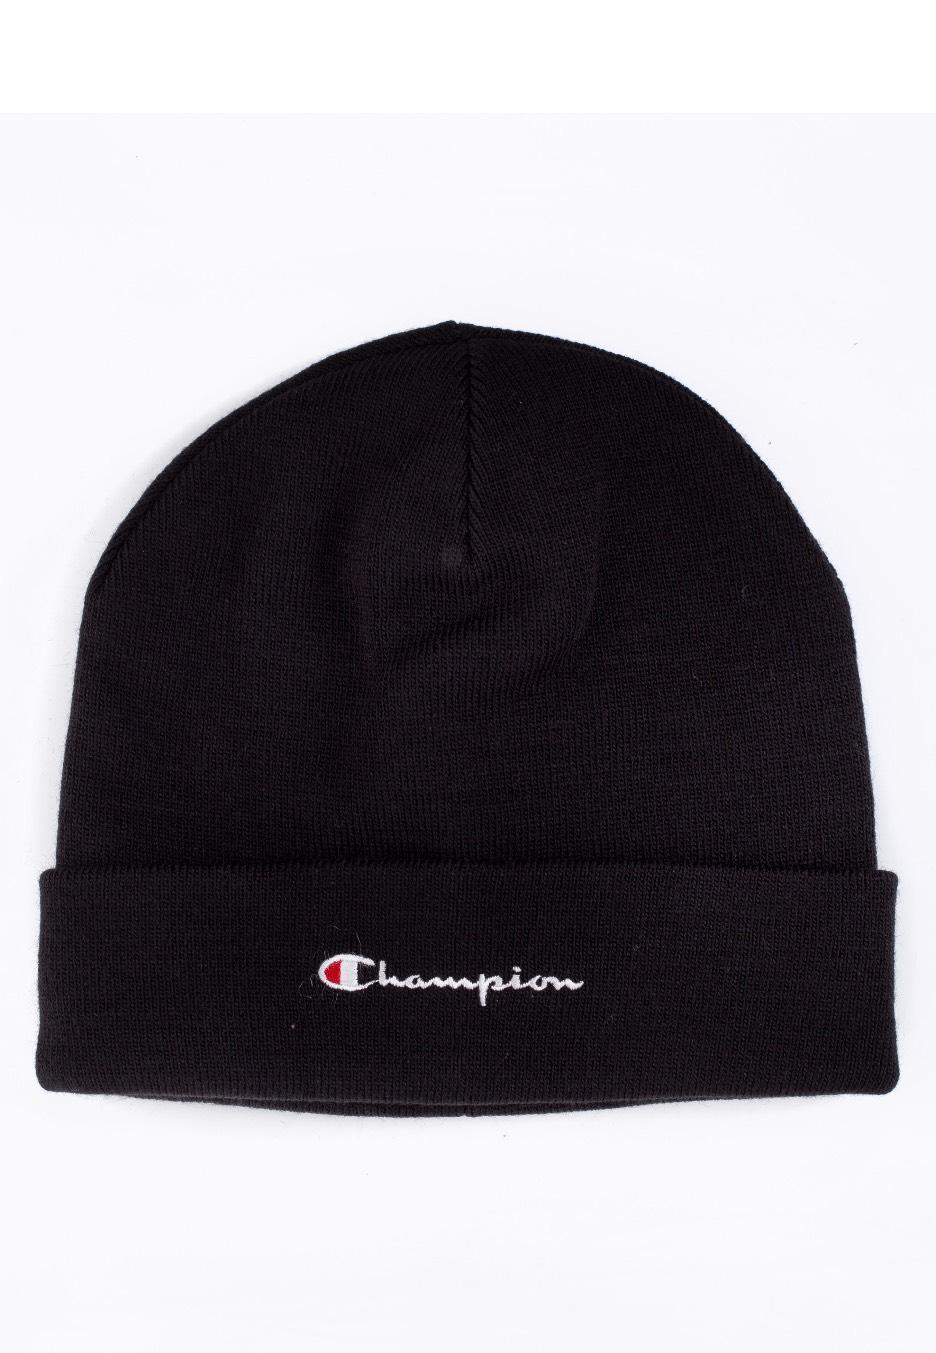 8df8b96bf8 Champion - Logo NBK - Beanie - Streetwear Shop - Impericon.com UK